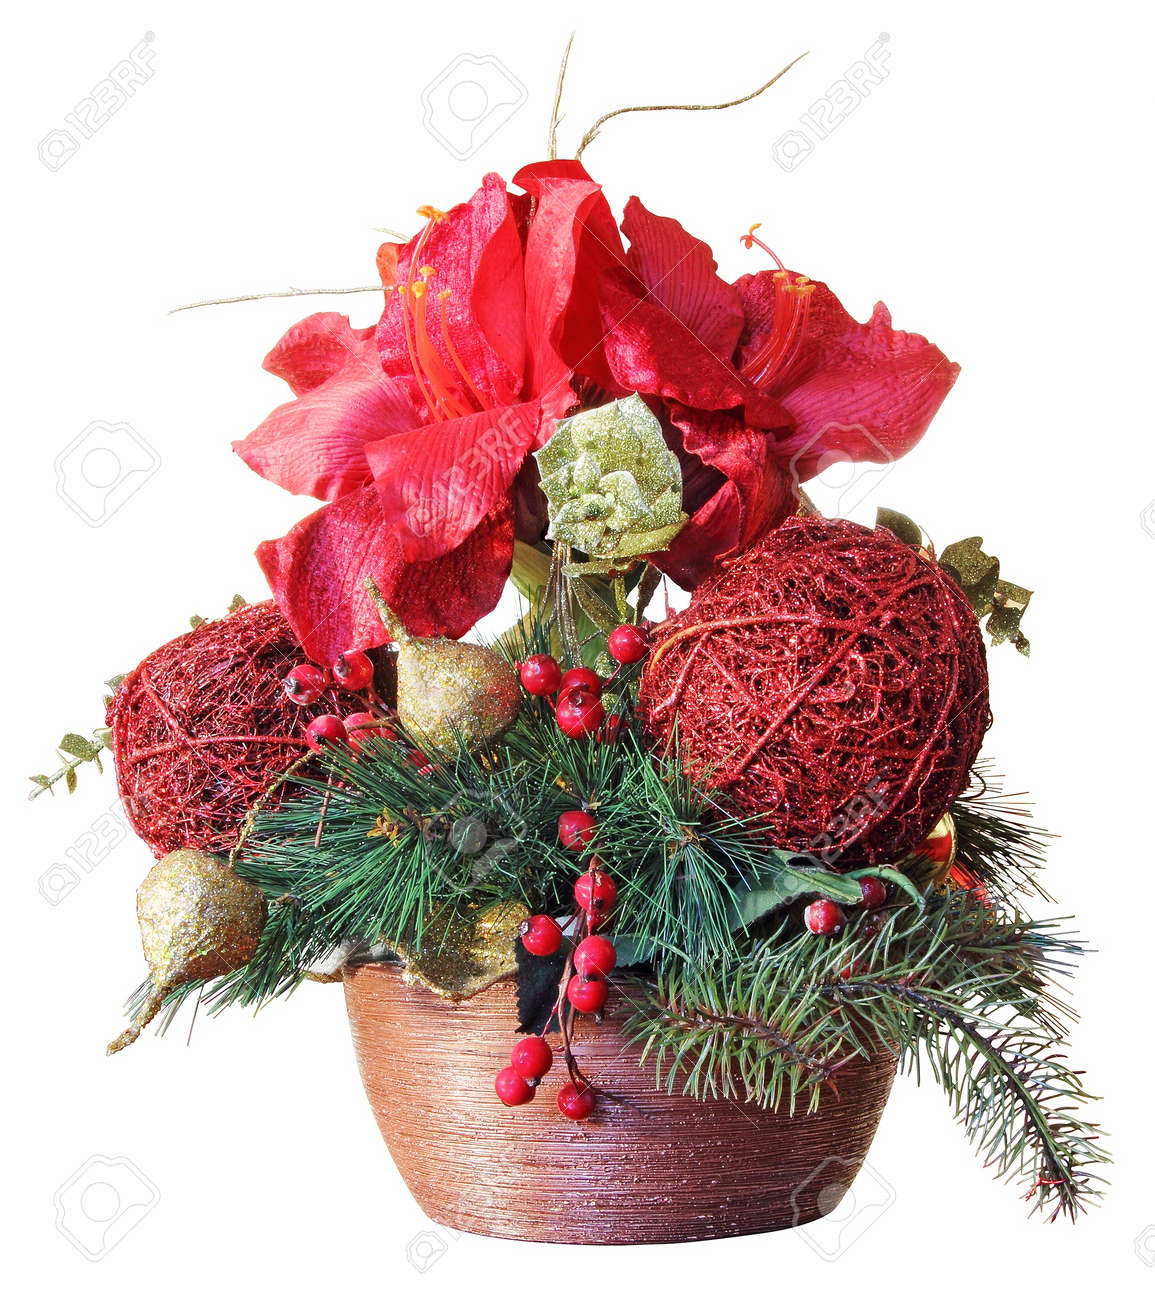 Christmas Flower Arrangements Images.Beautiful Christmas Flower Arrangement Isolated On White Background